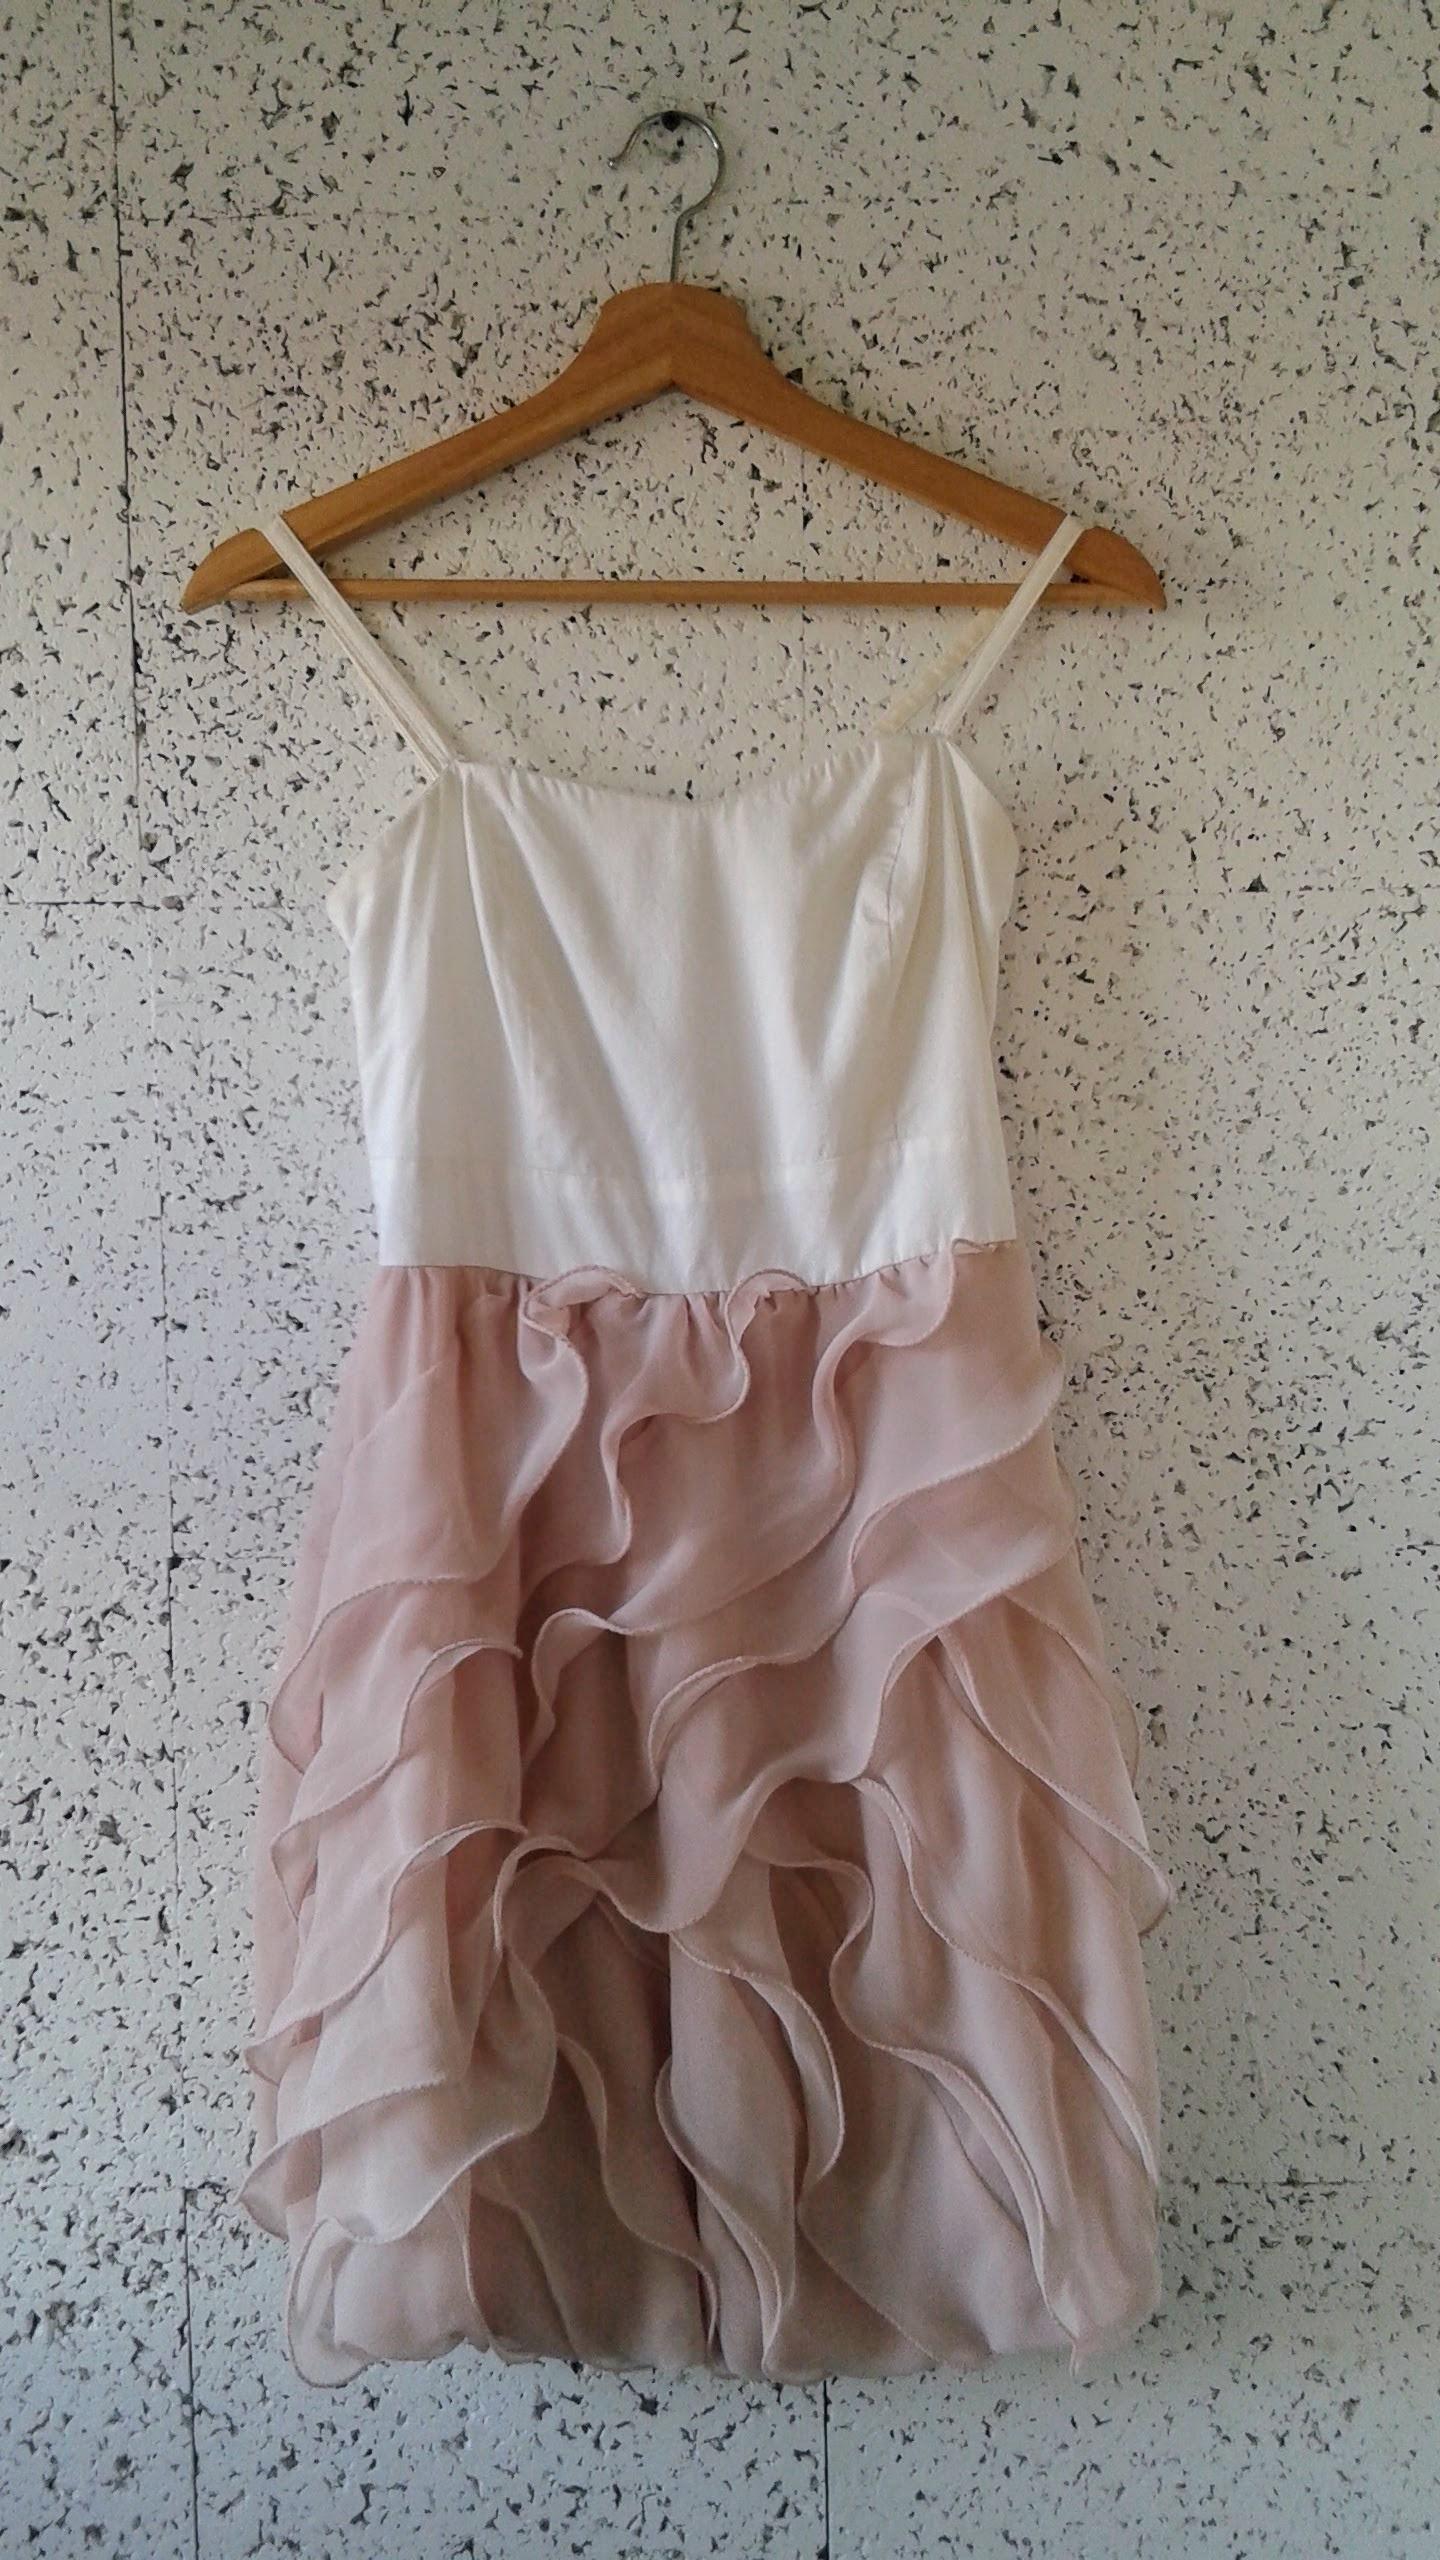 Vero Moda dress; Size S, $26